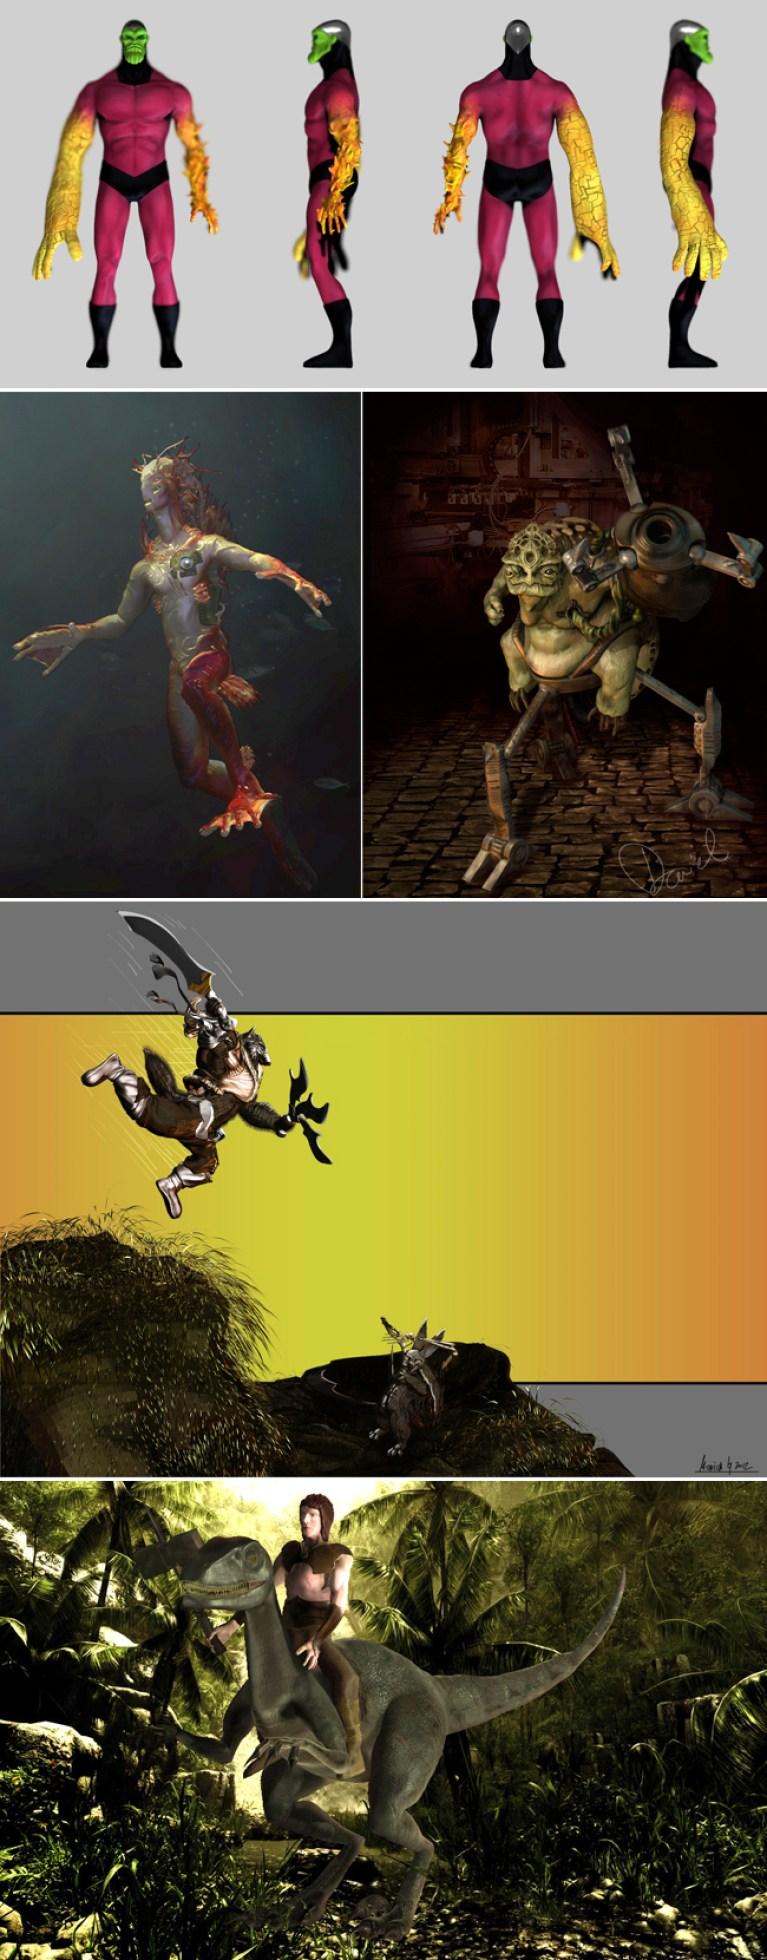 Zbrush-Madrid-Cursos-Animacion-Academiac10-videojuegos